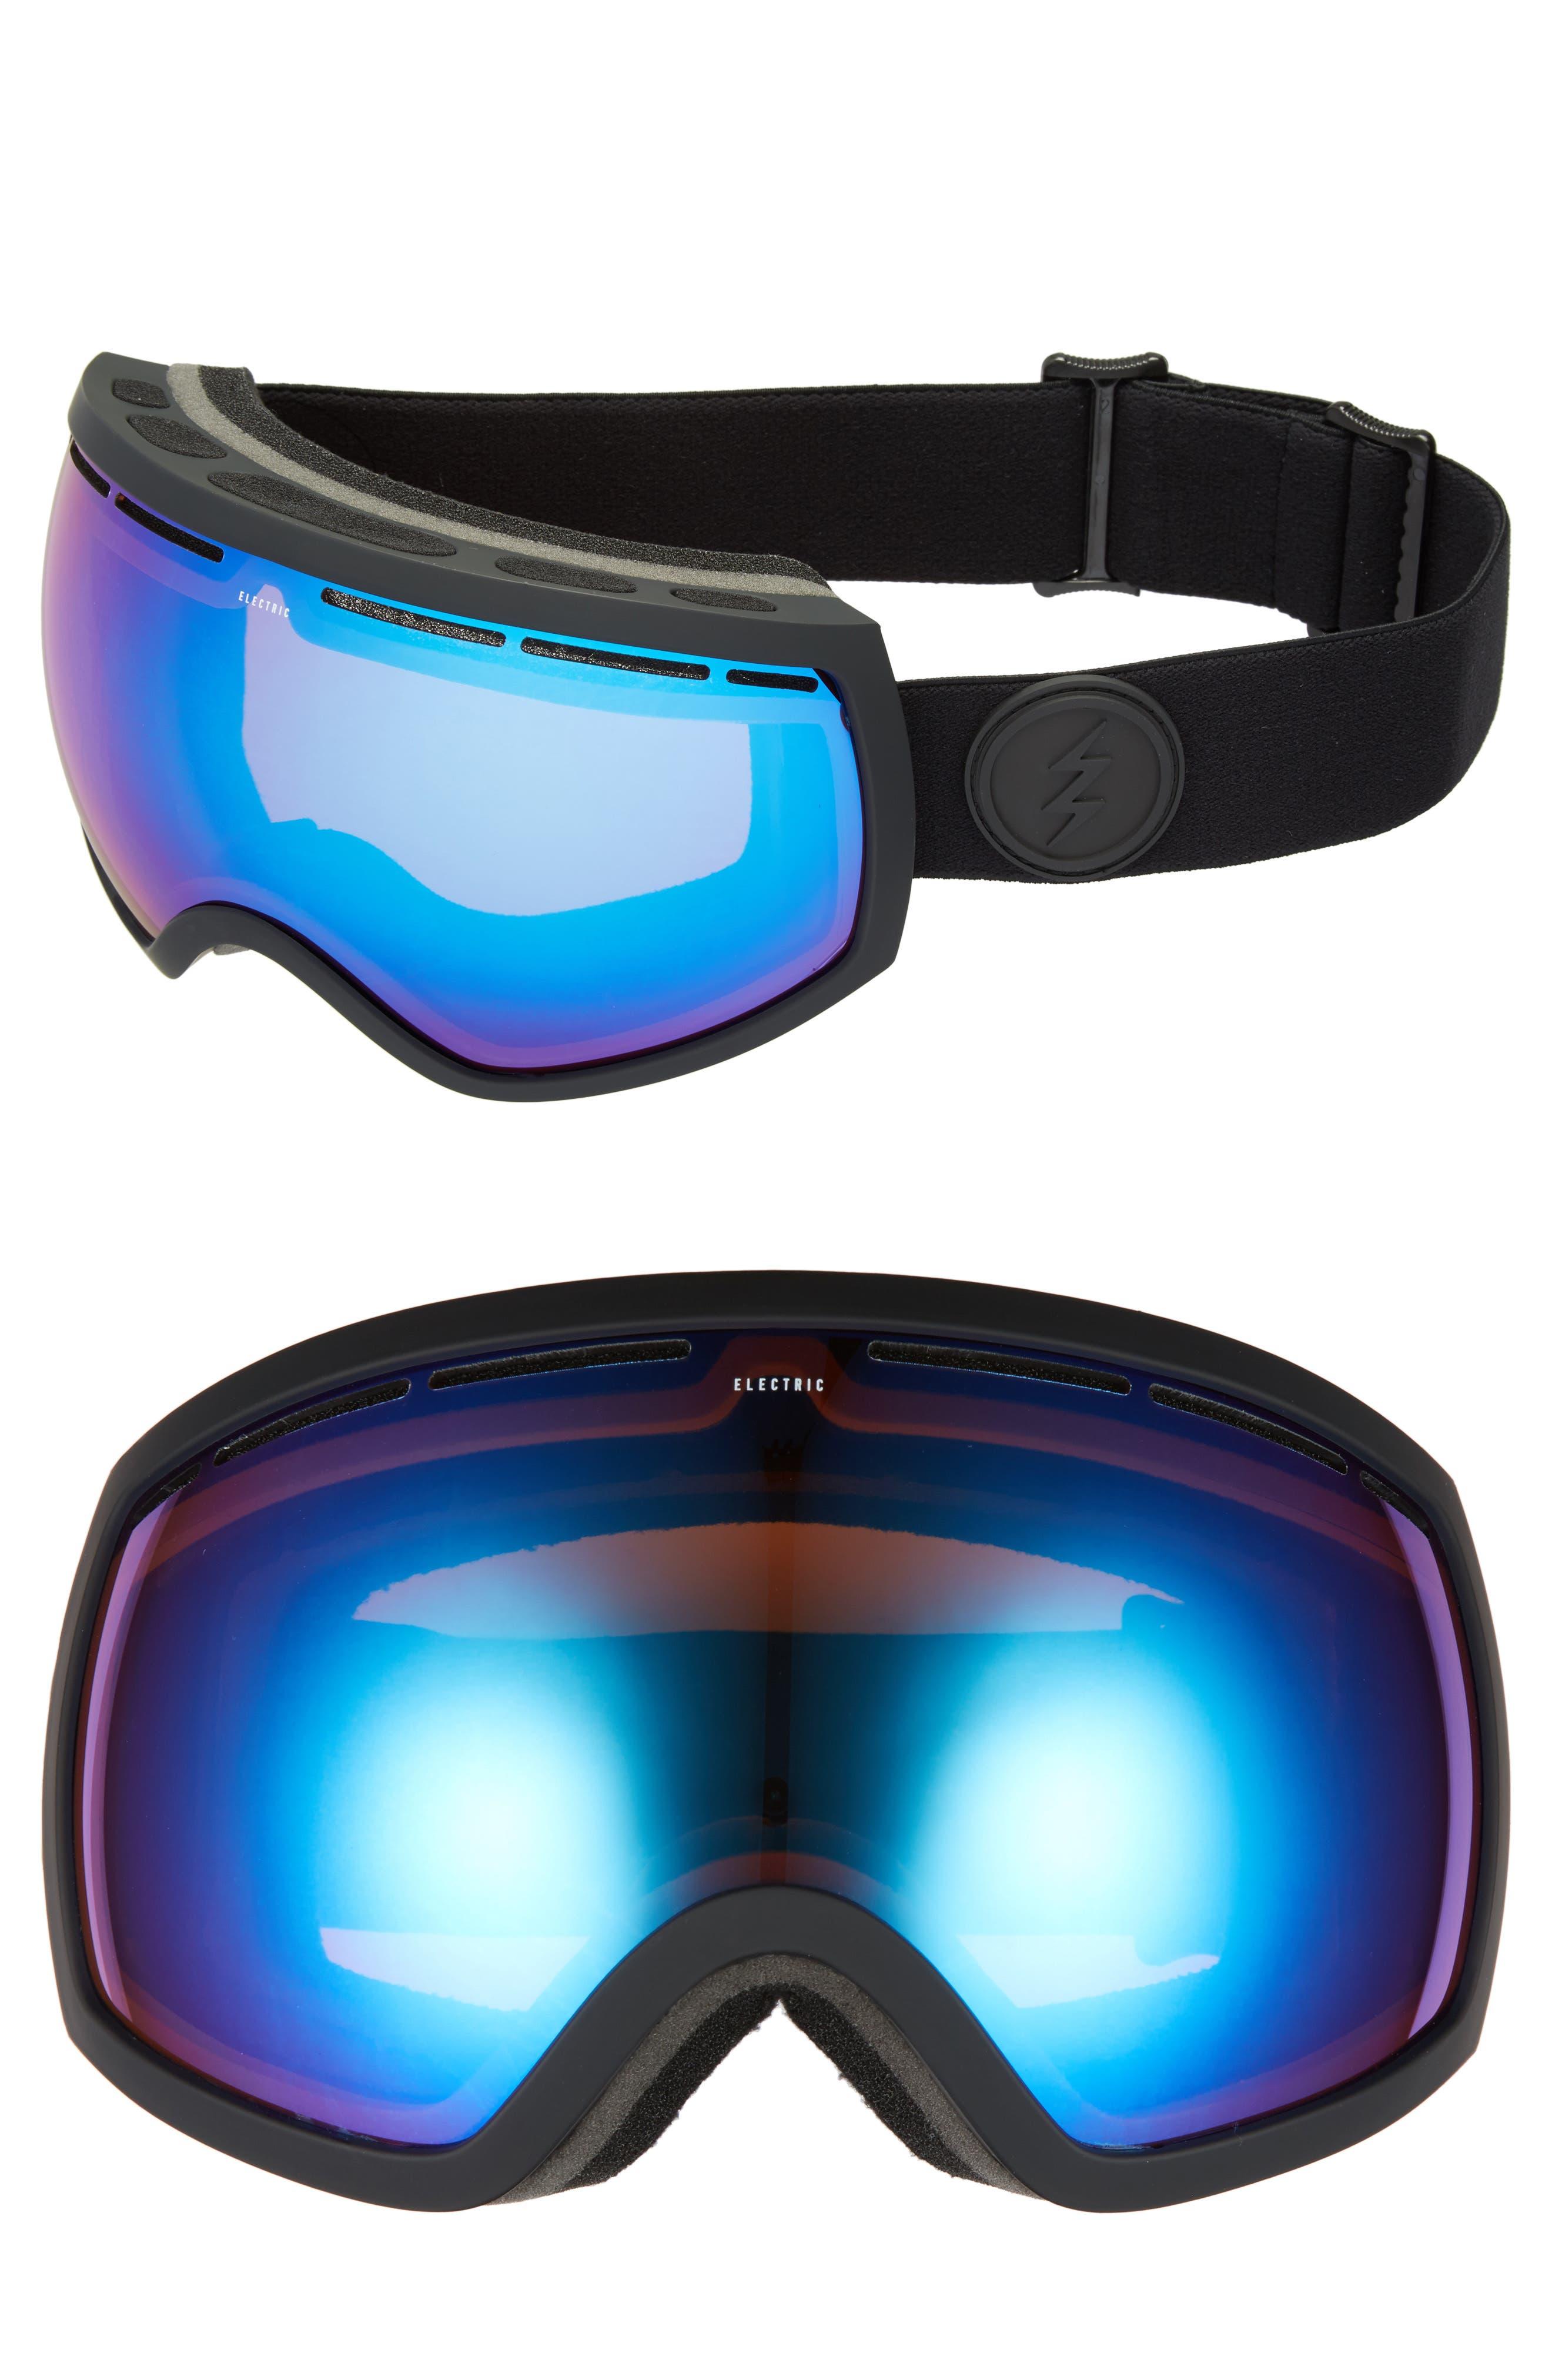 EG2 Snow Goggles,                             Main thumbnail 1, color,                             Matte Black/ Blue Chrome